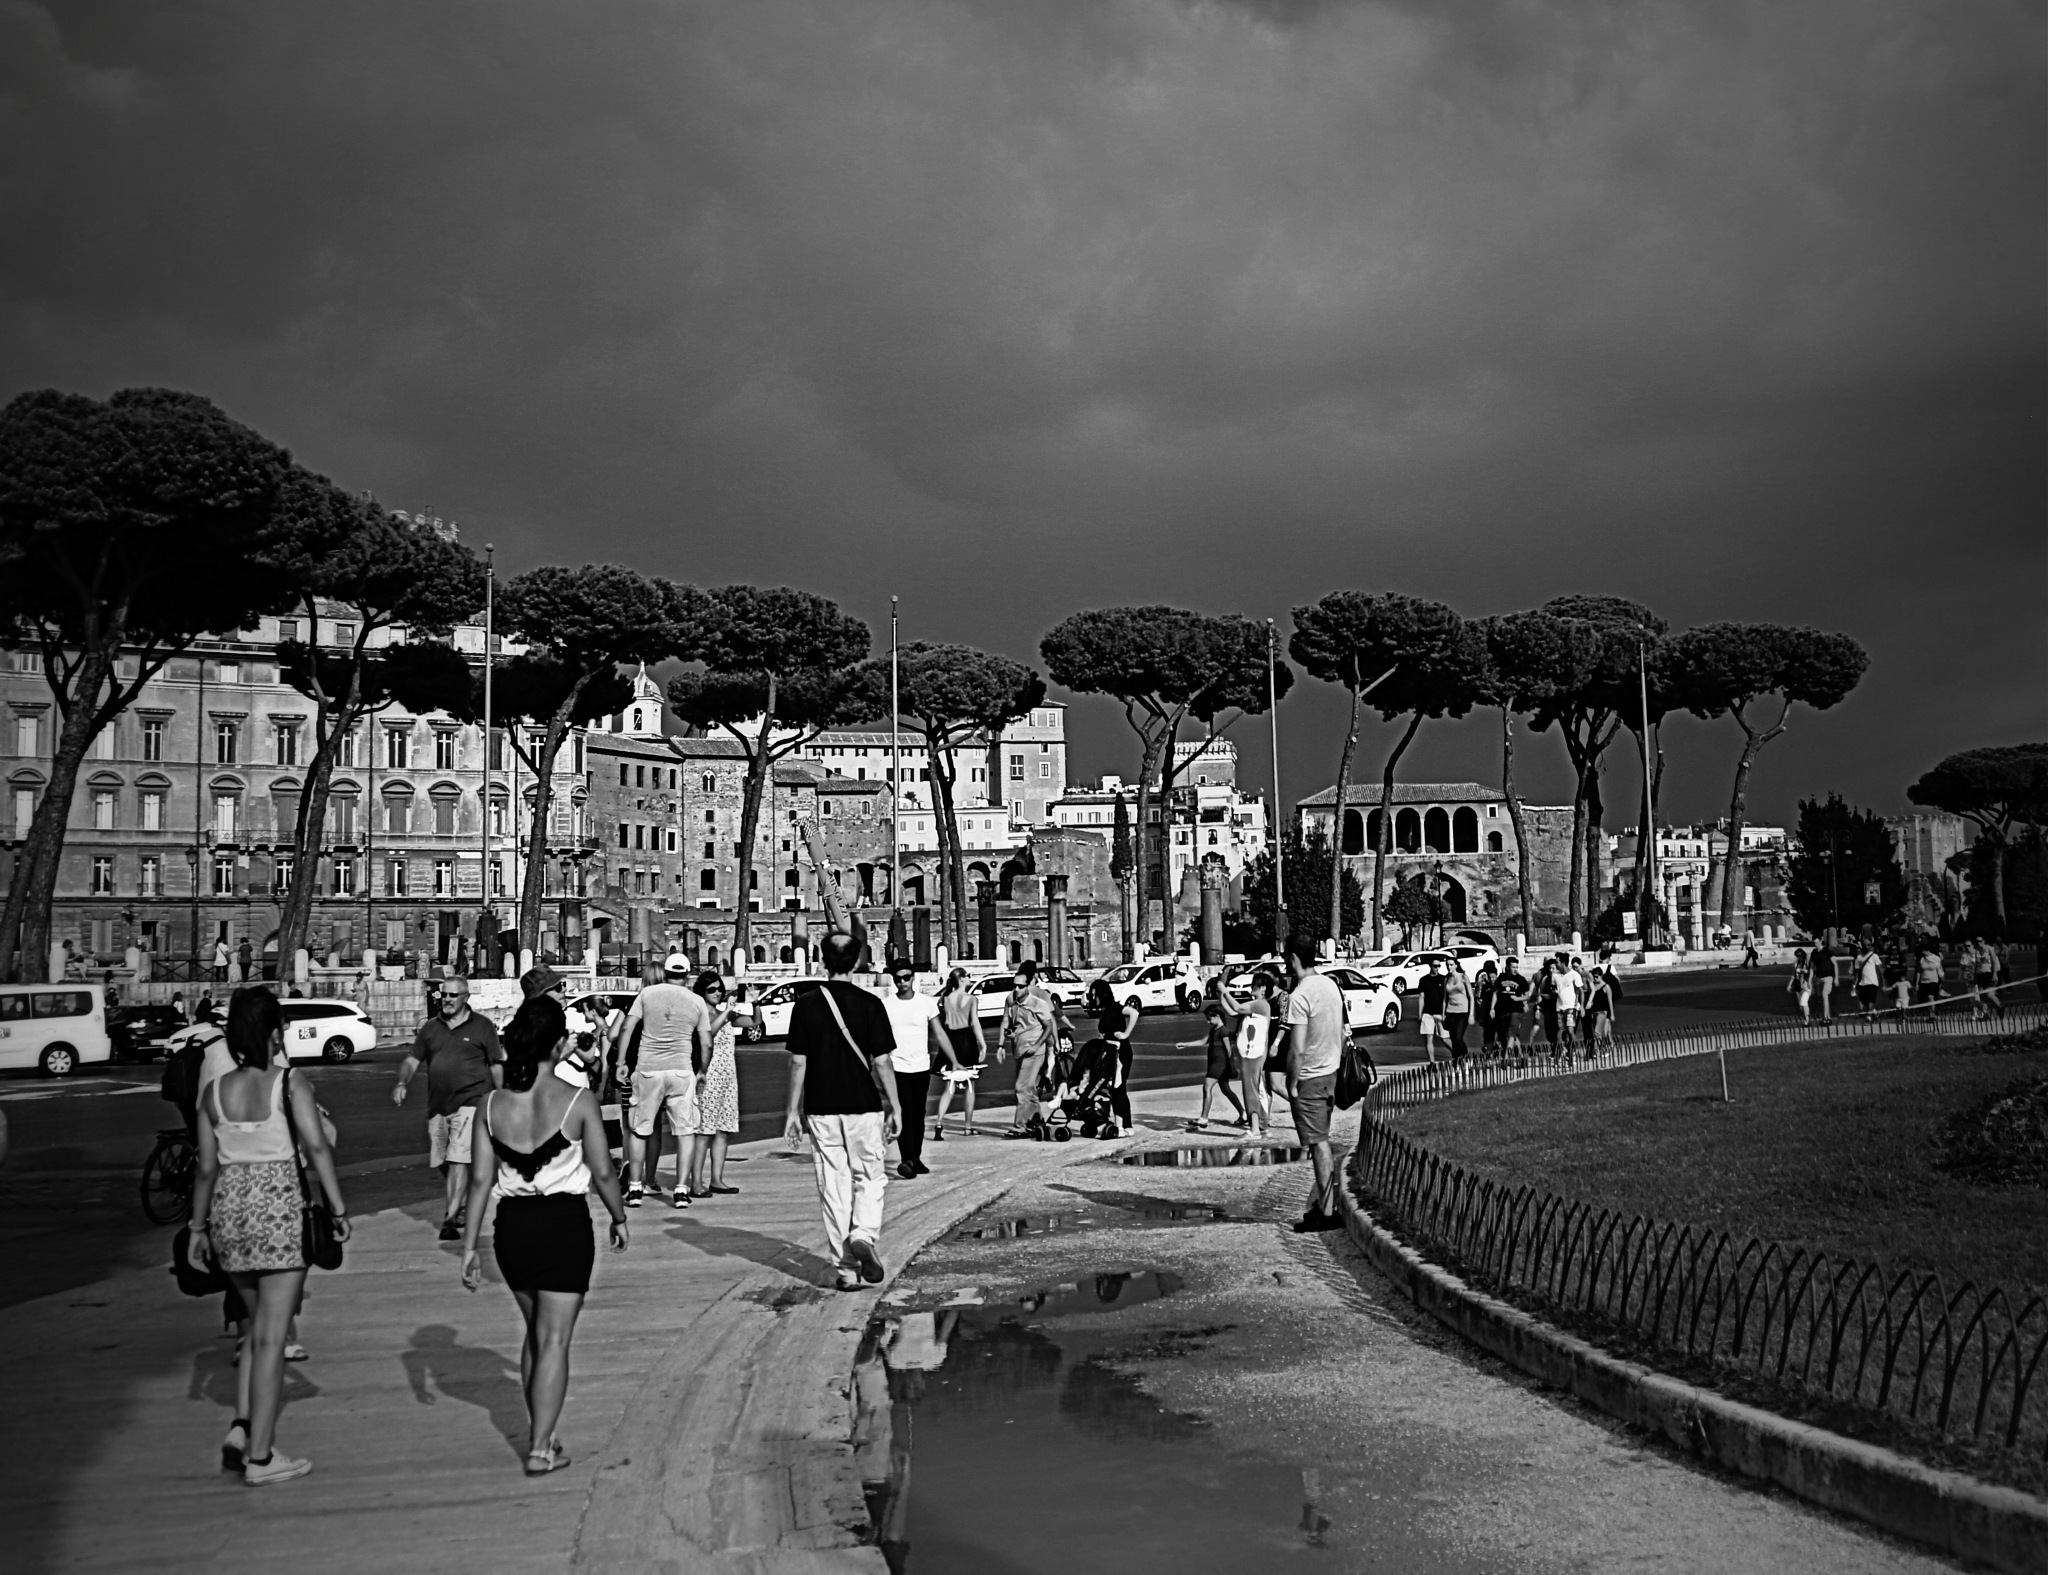 Rain in Rome by Elisabeth Alkaya